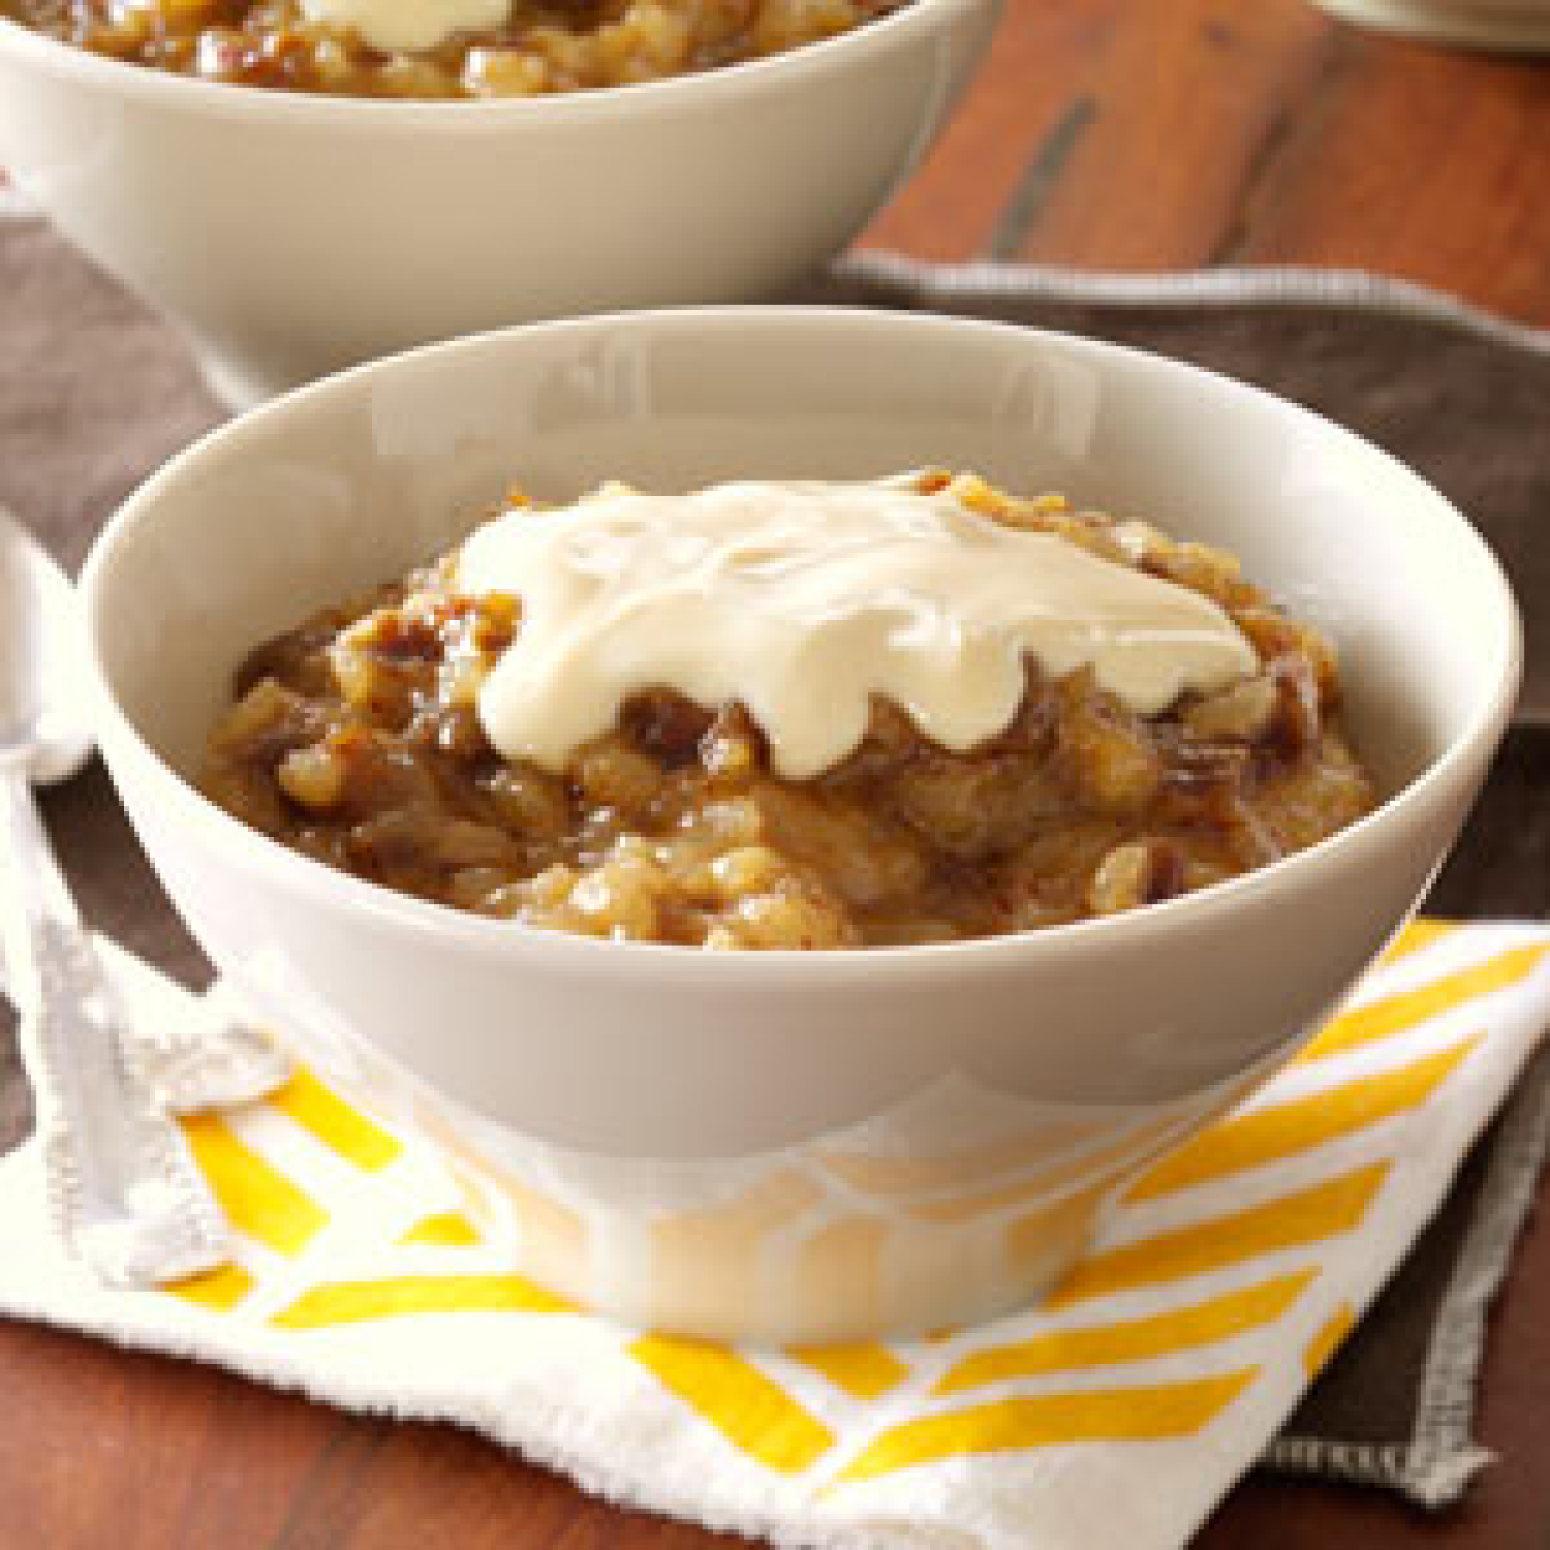 Gingered Creme Caramel Rice Pudding Recipes — Dishmaps